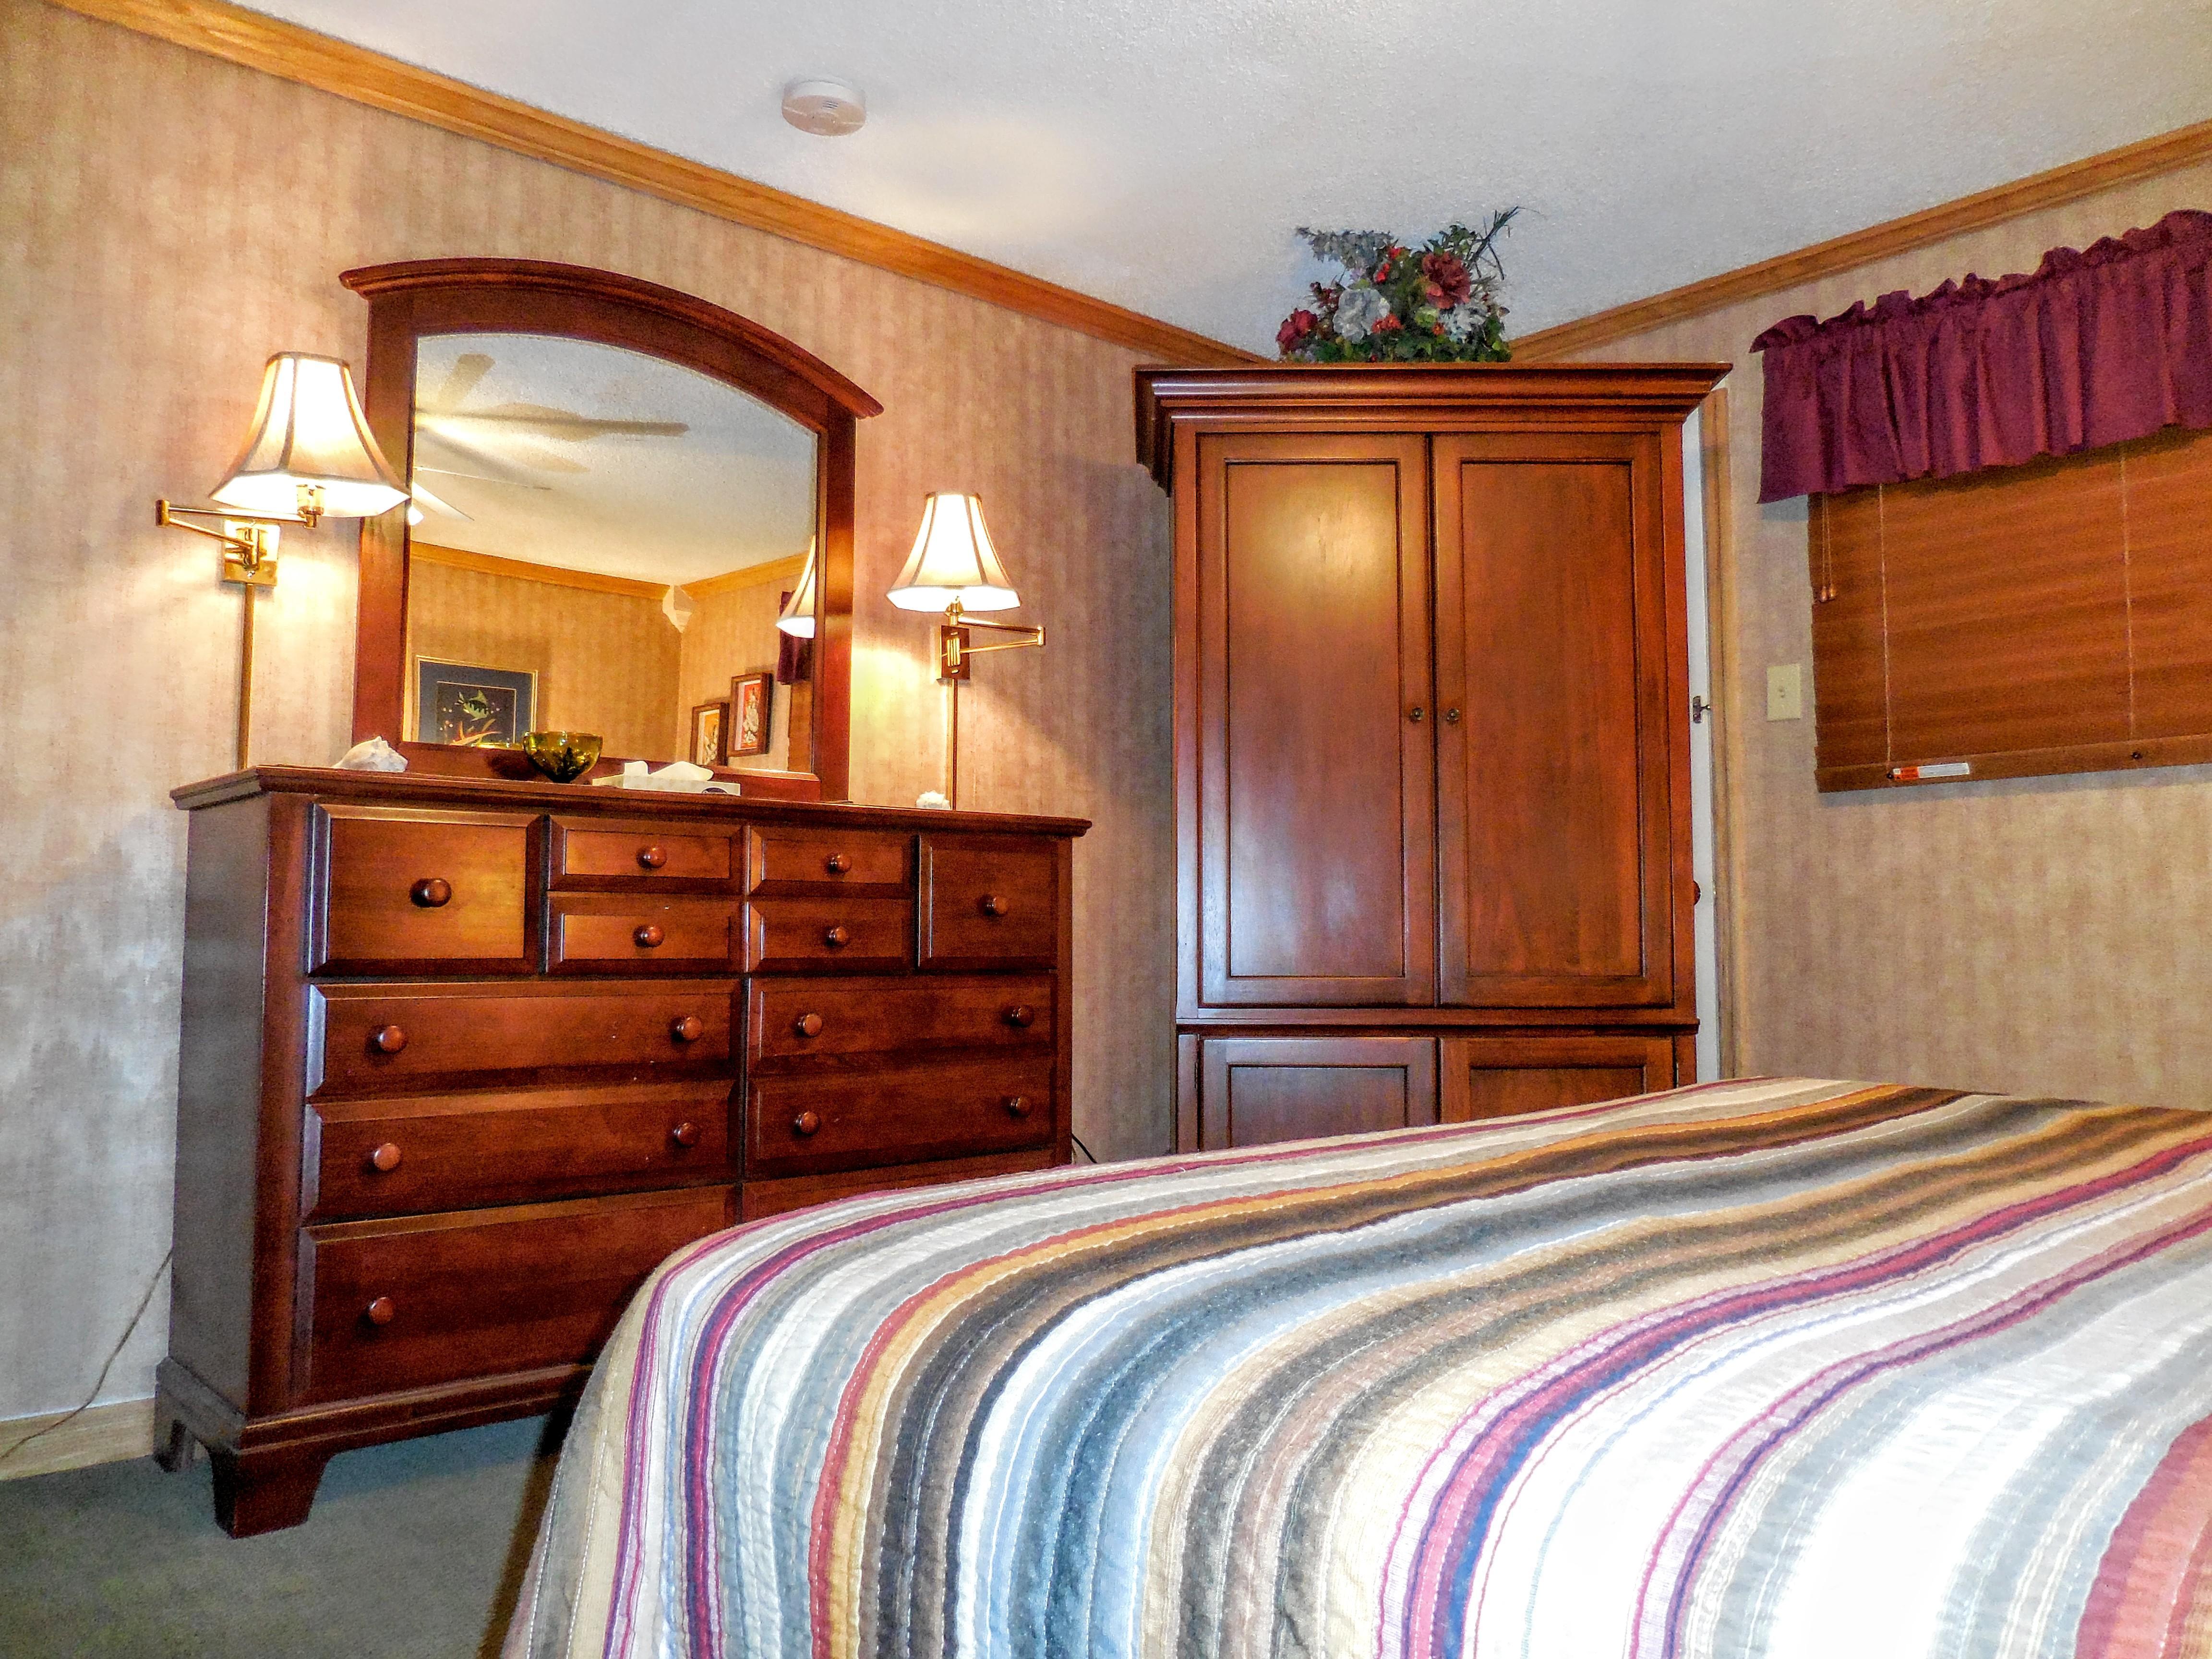 Plenty of storage in master bedroom (armoire and dresser)